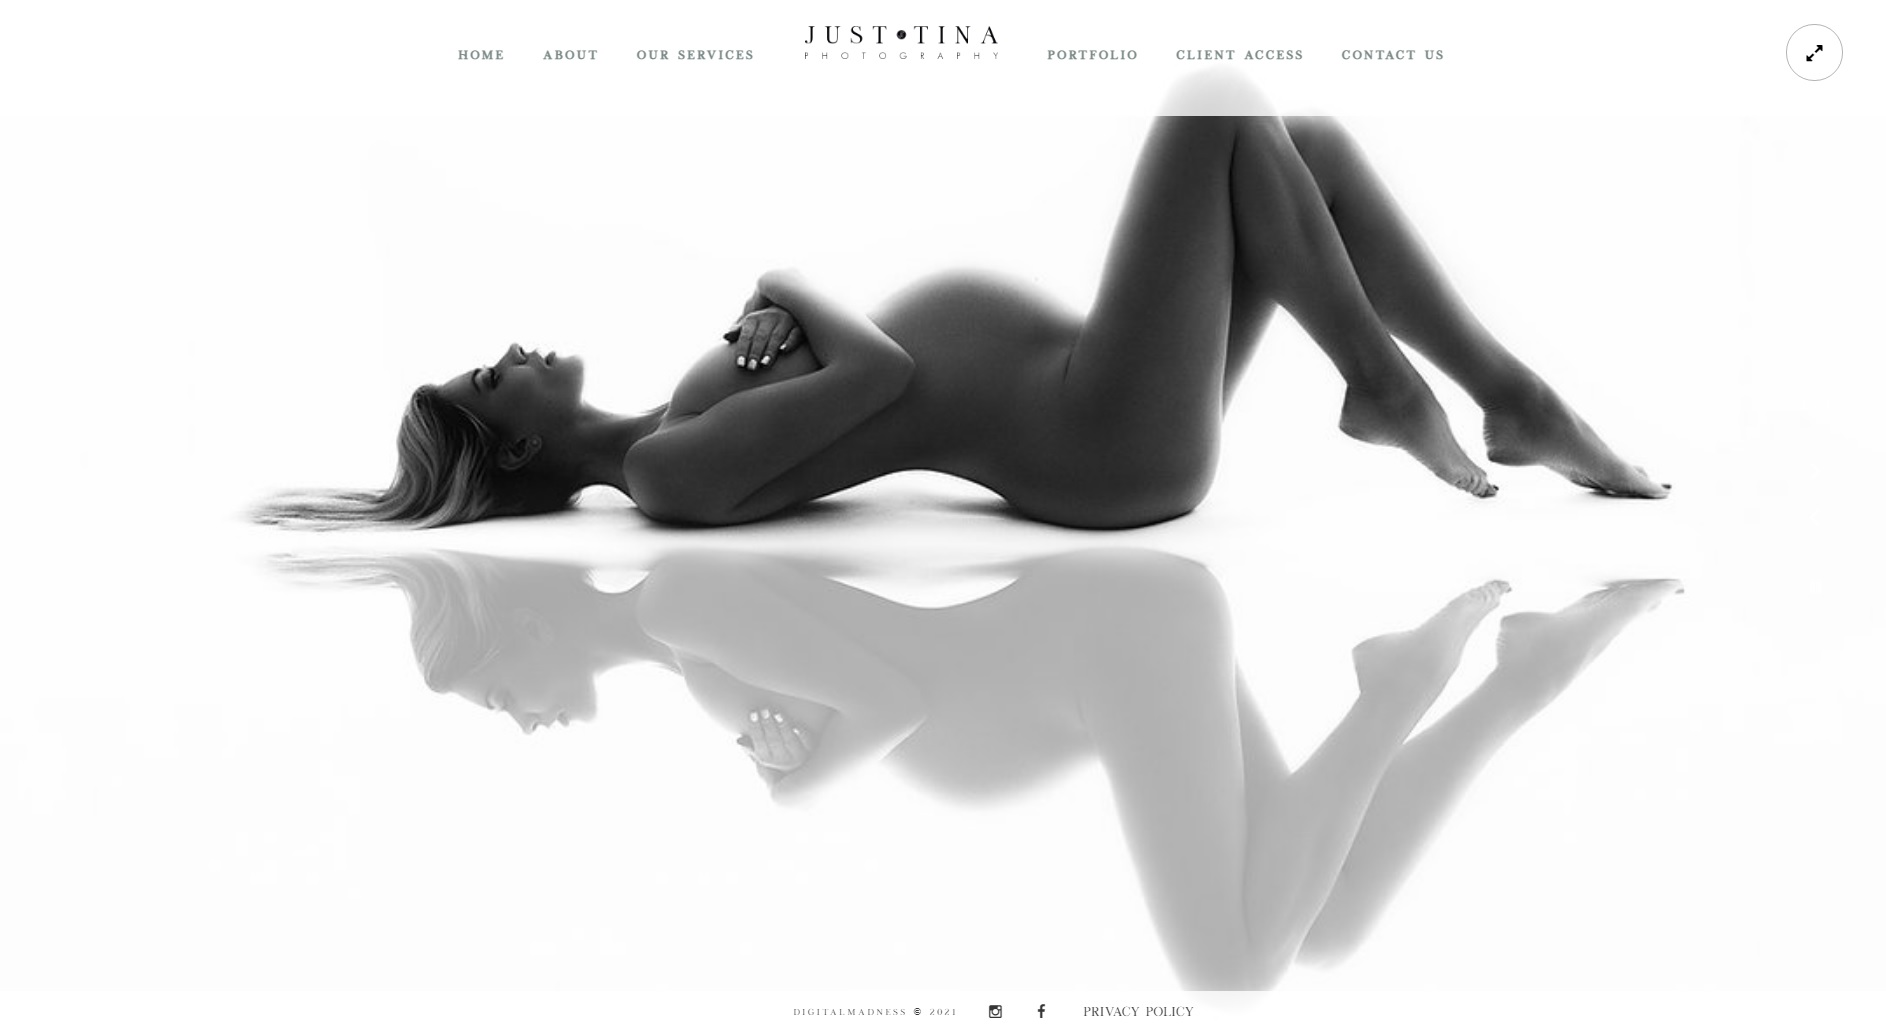 justtina_photography